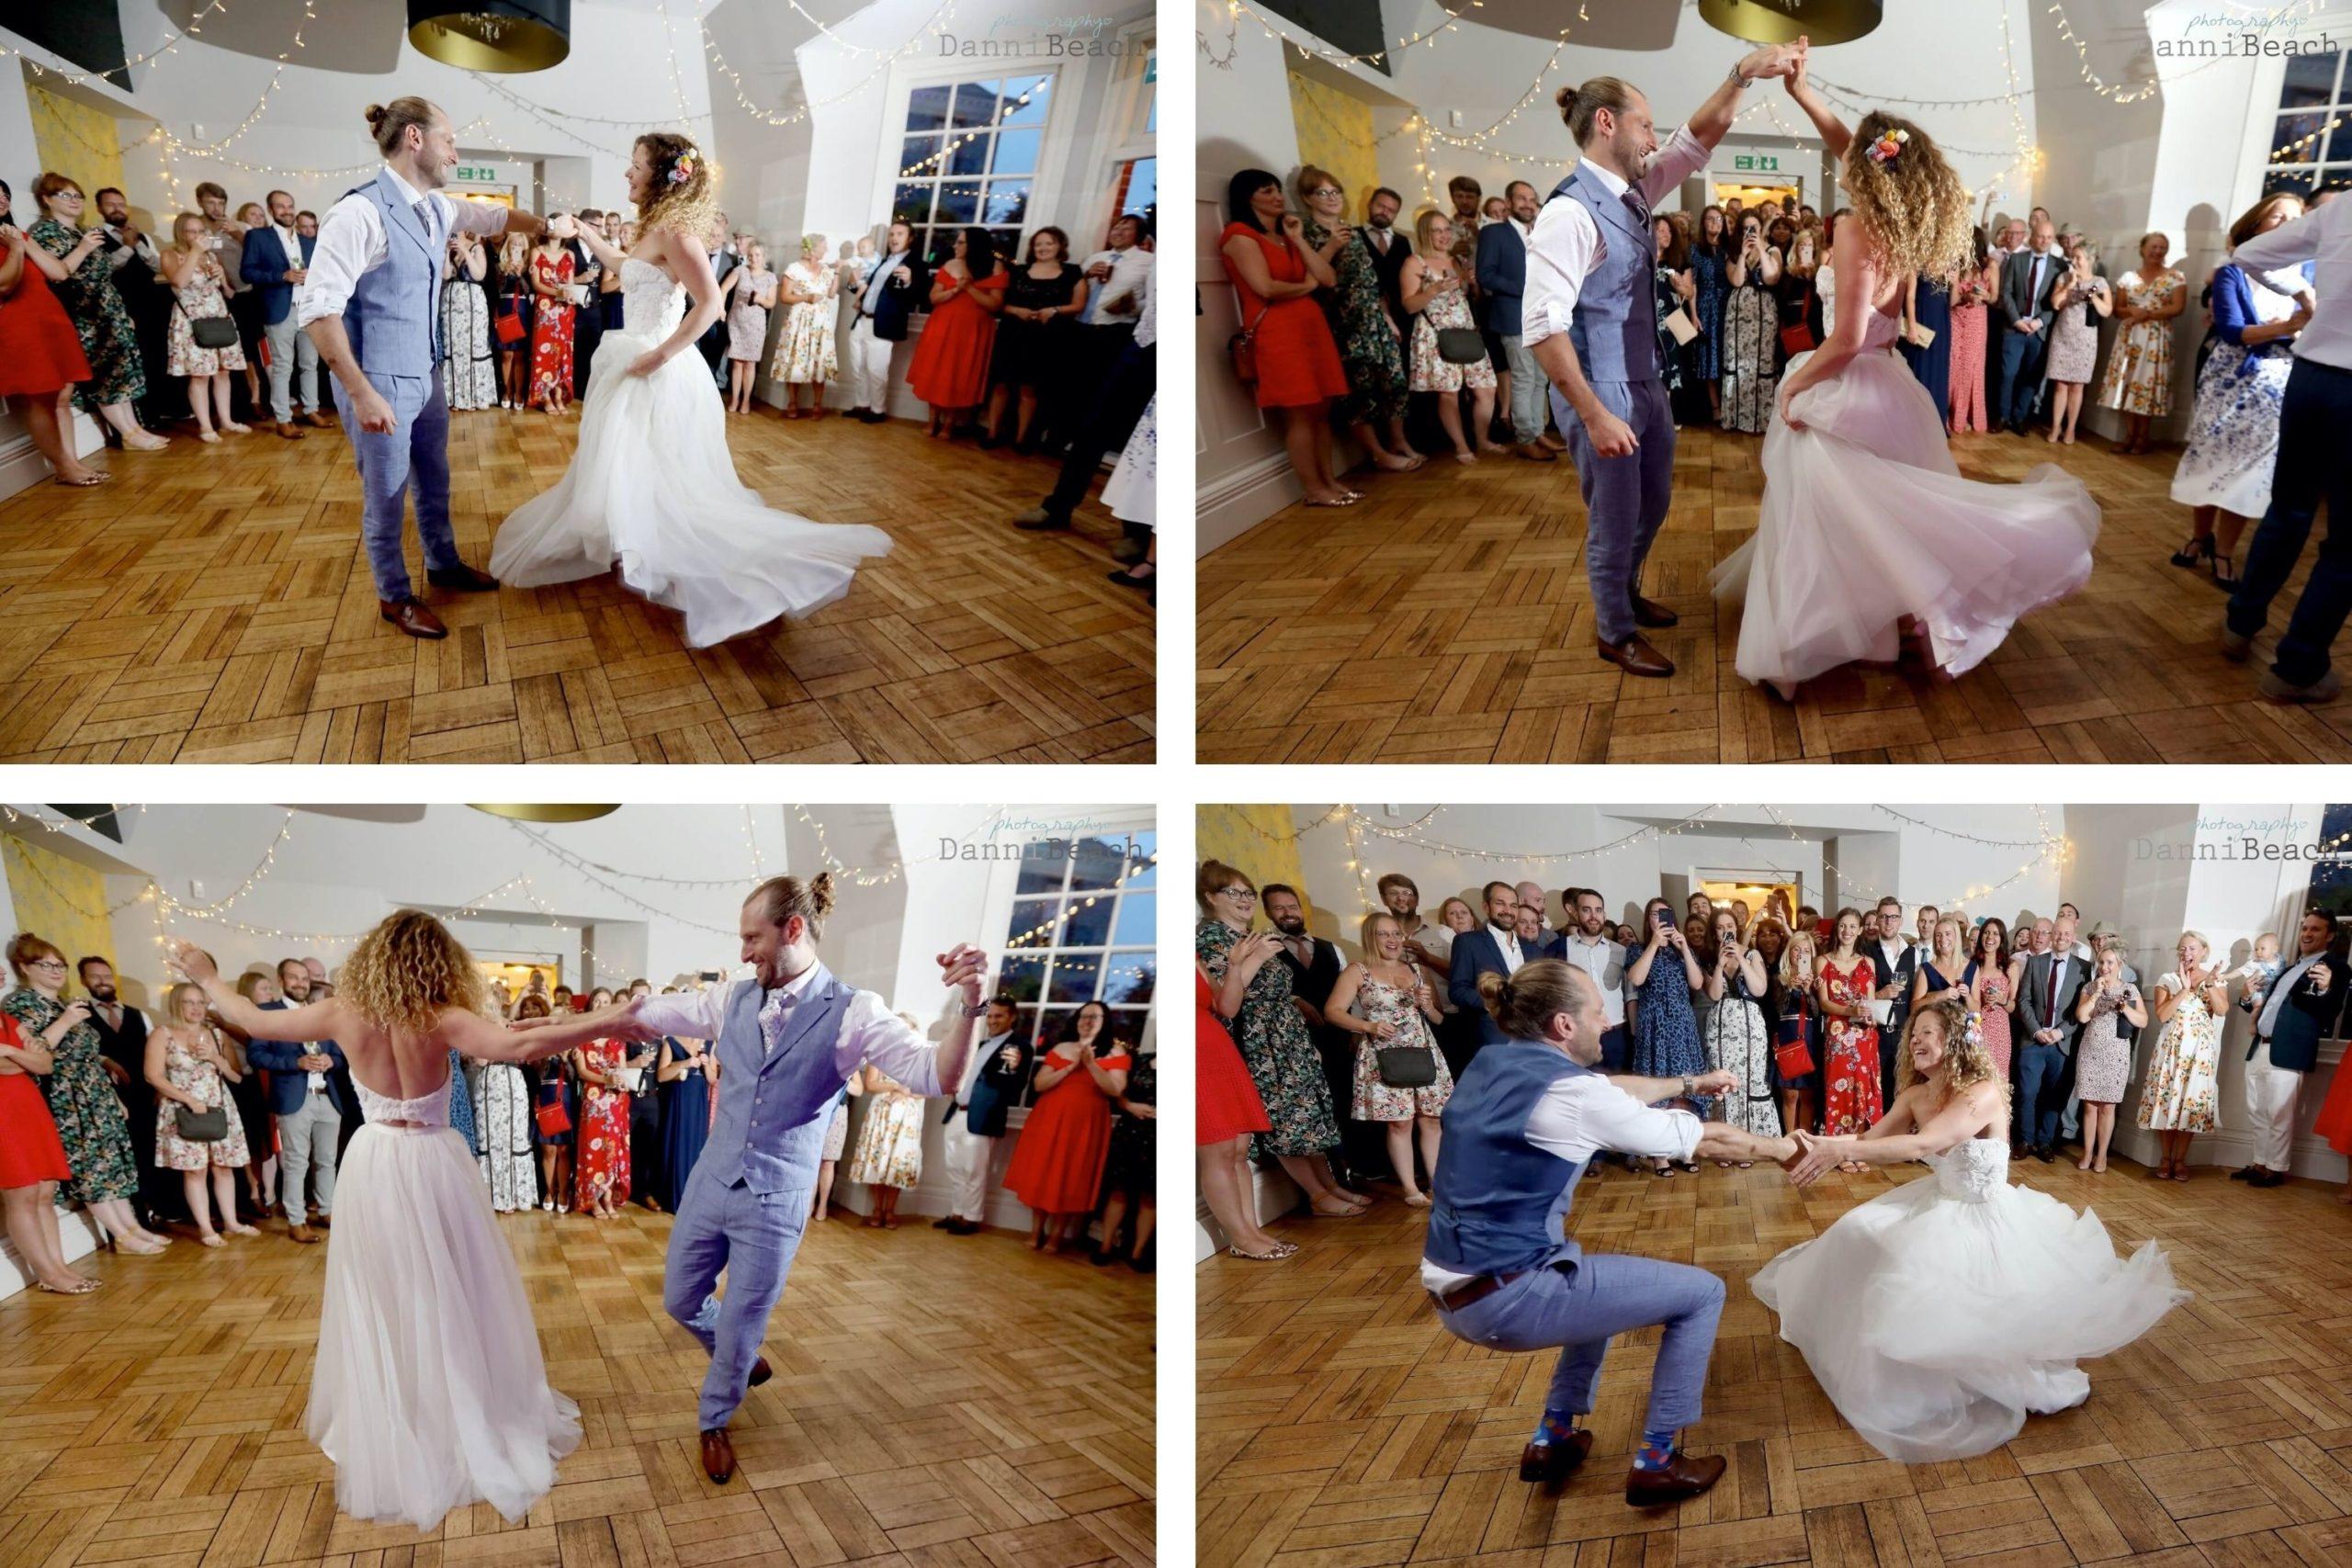 Gildredge epic wedding photographer